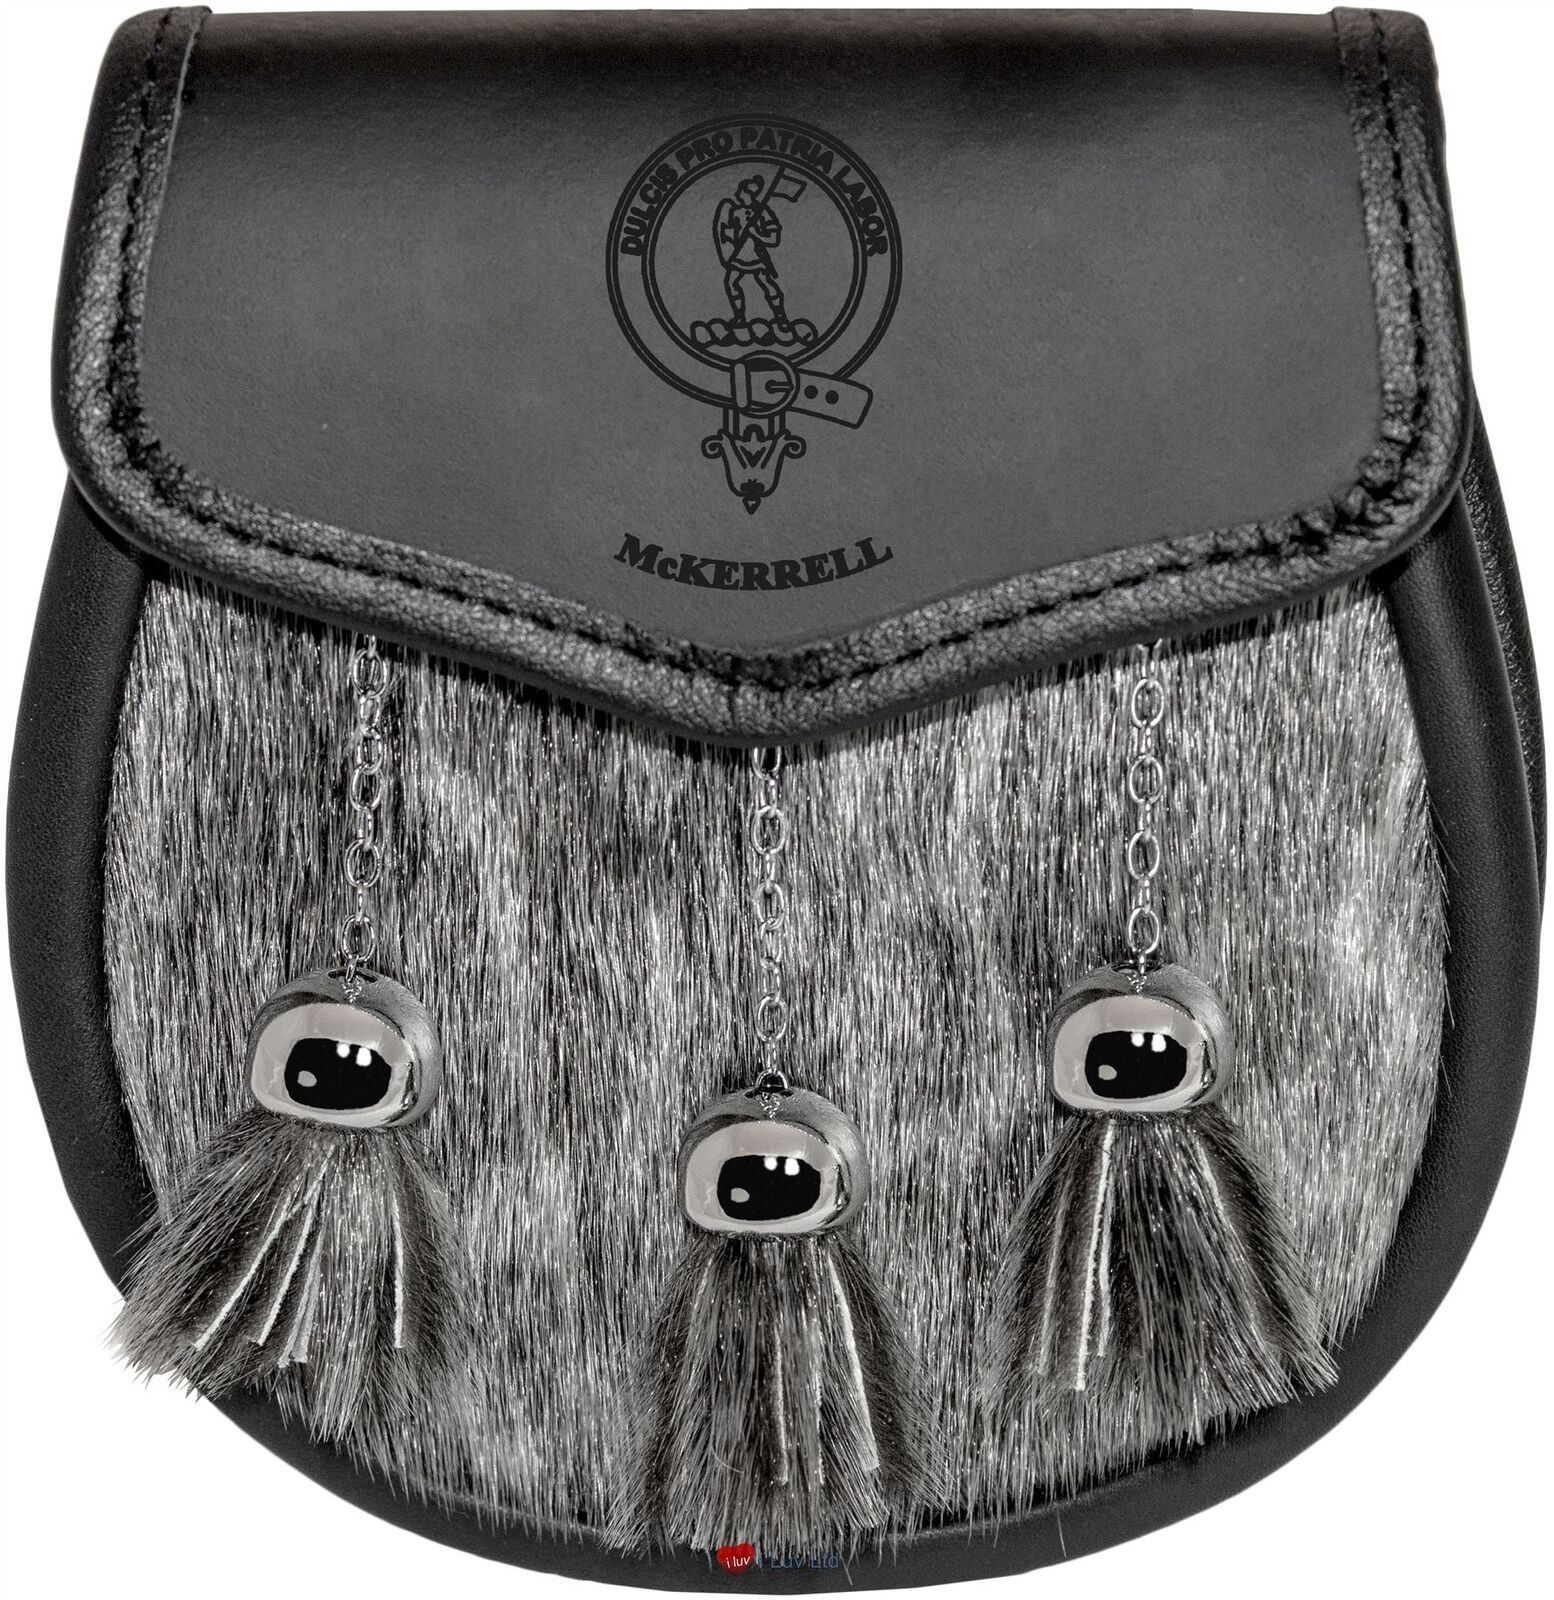 McKerrell Semi Sporran Fur Plain Leather Flap Scottish Clan Crest